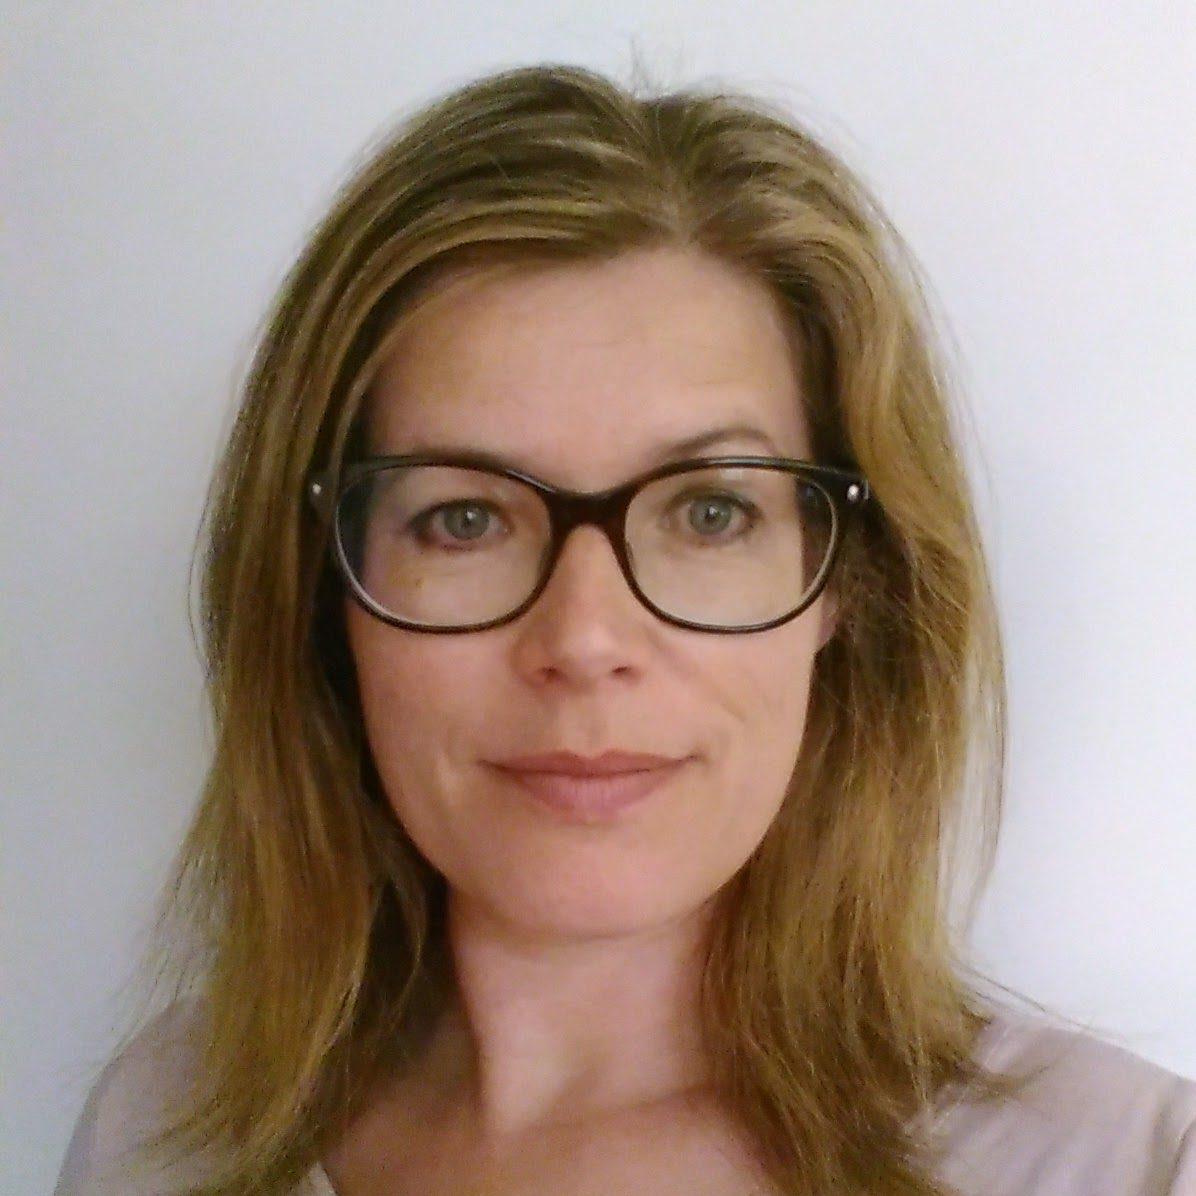 Danielle van der Burgt, Senior Lecturer, Uppsala University, Sweden